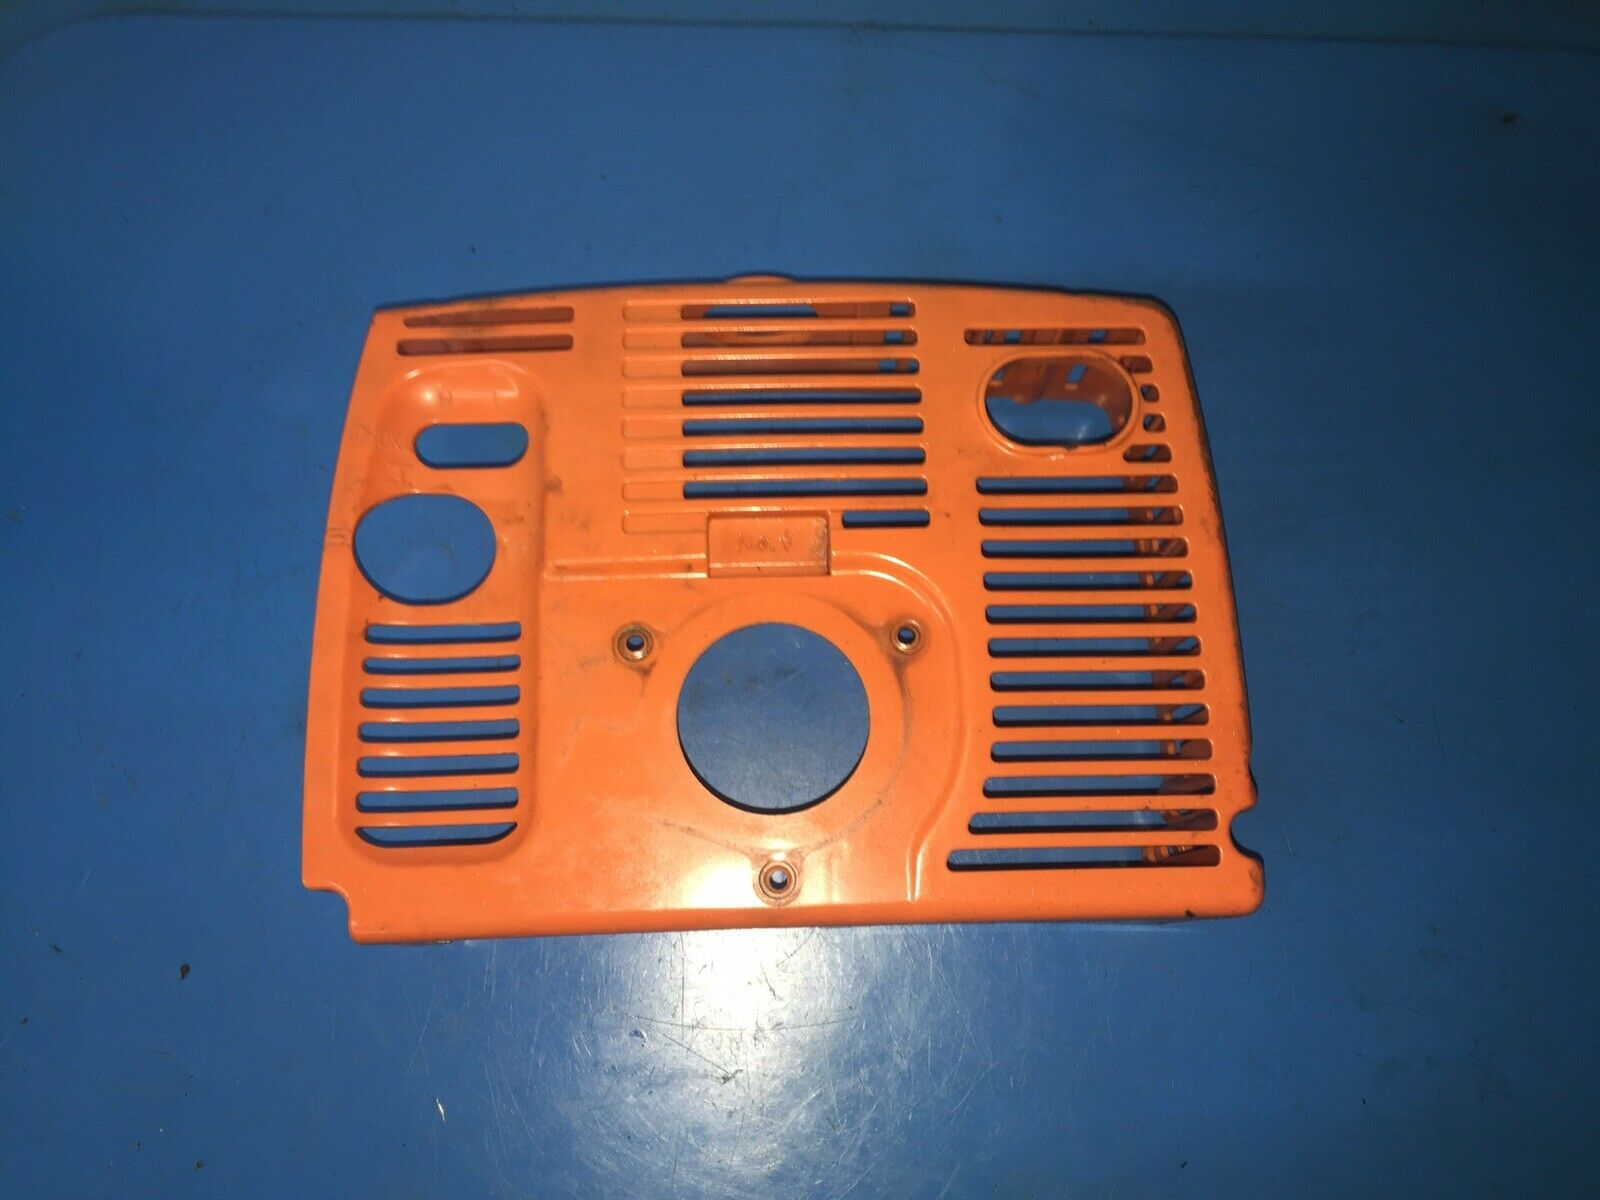 GENUIN STIHL fs38 fs45 fs 55 fs46 carburetor base intake OEM NEW